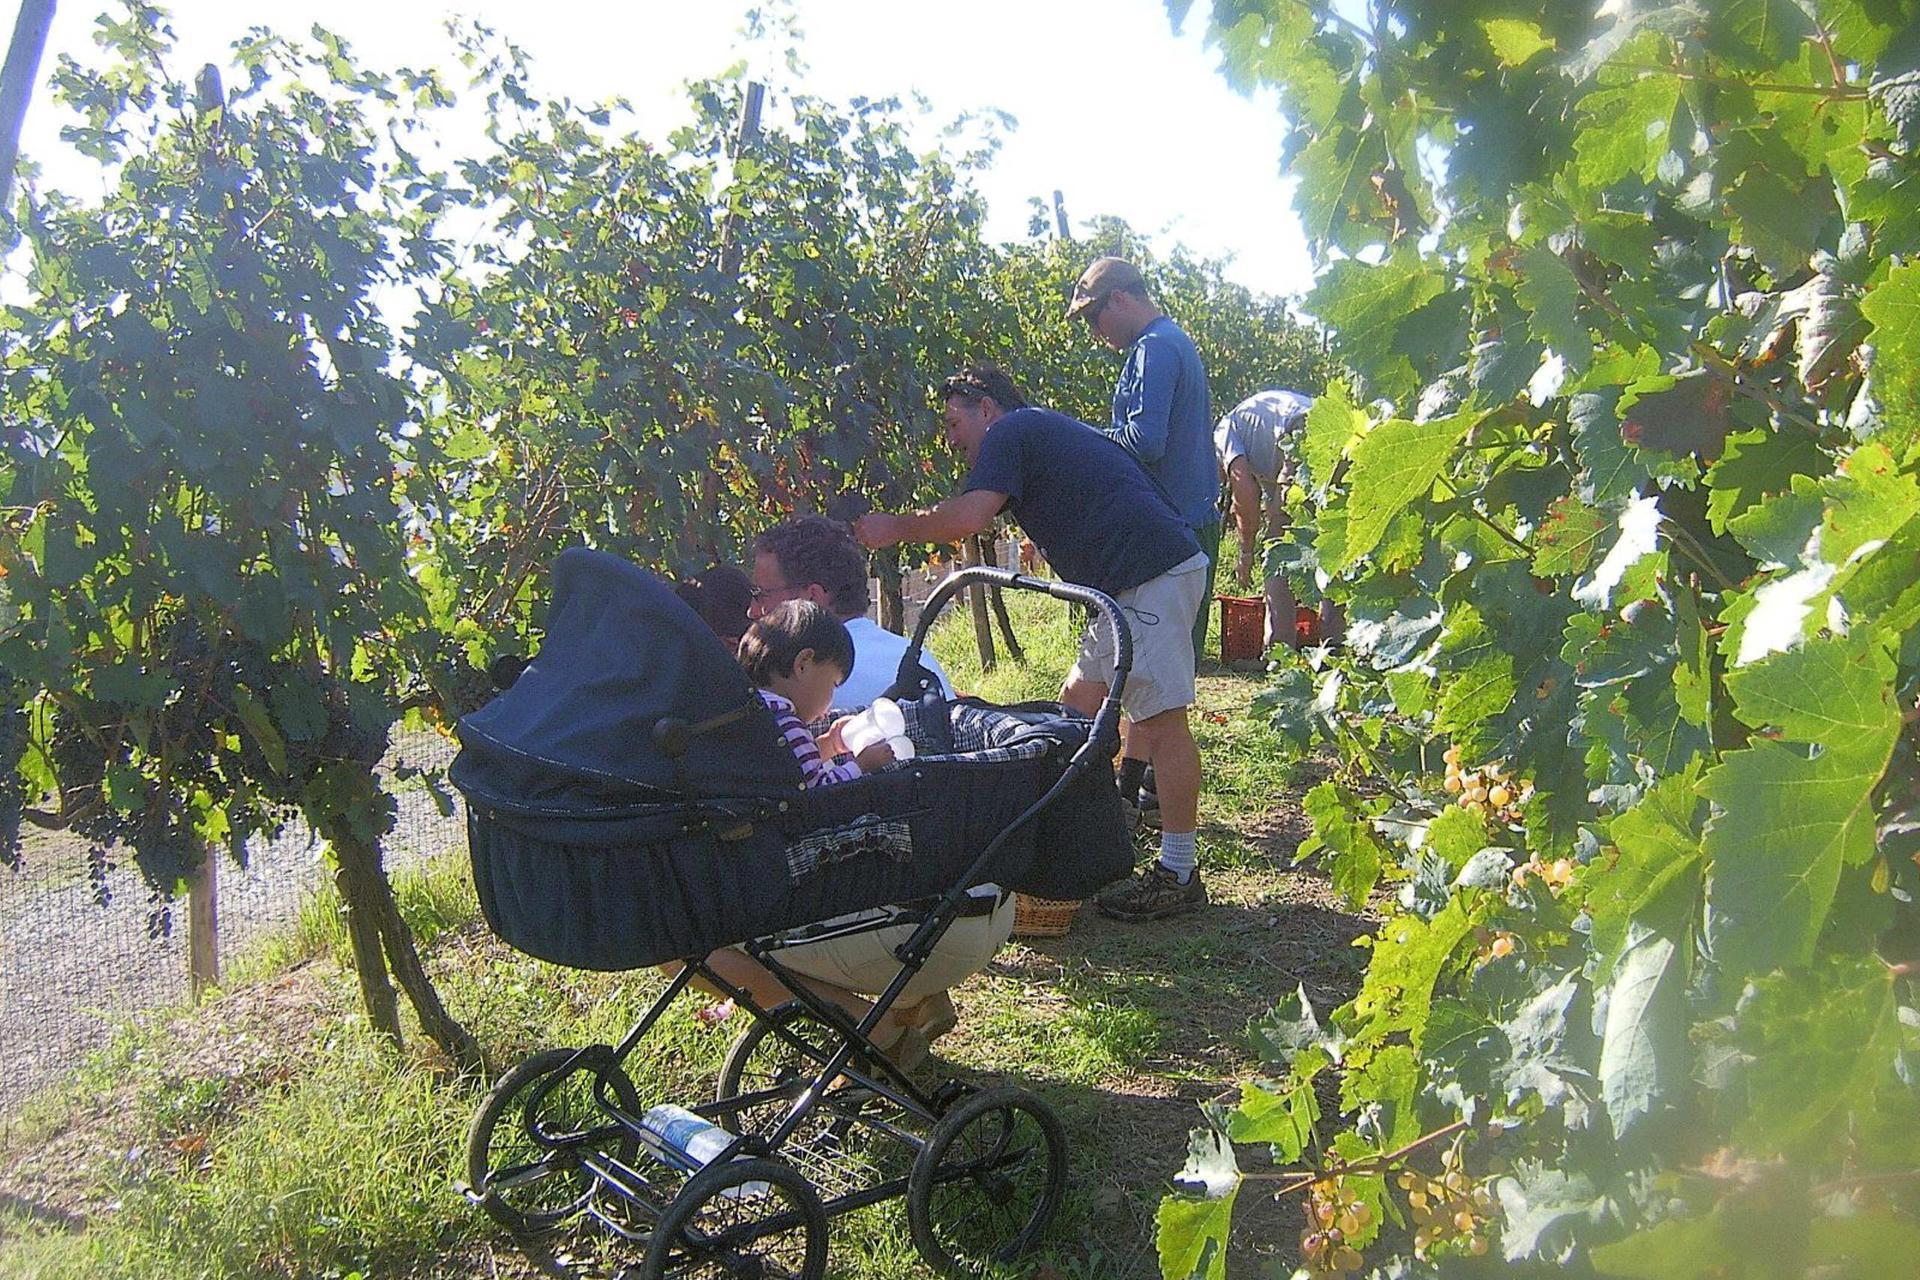 Agriturismo Le Marche Kindvriendelijke agriturismo in de heuvels van le Marche